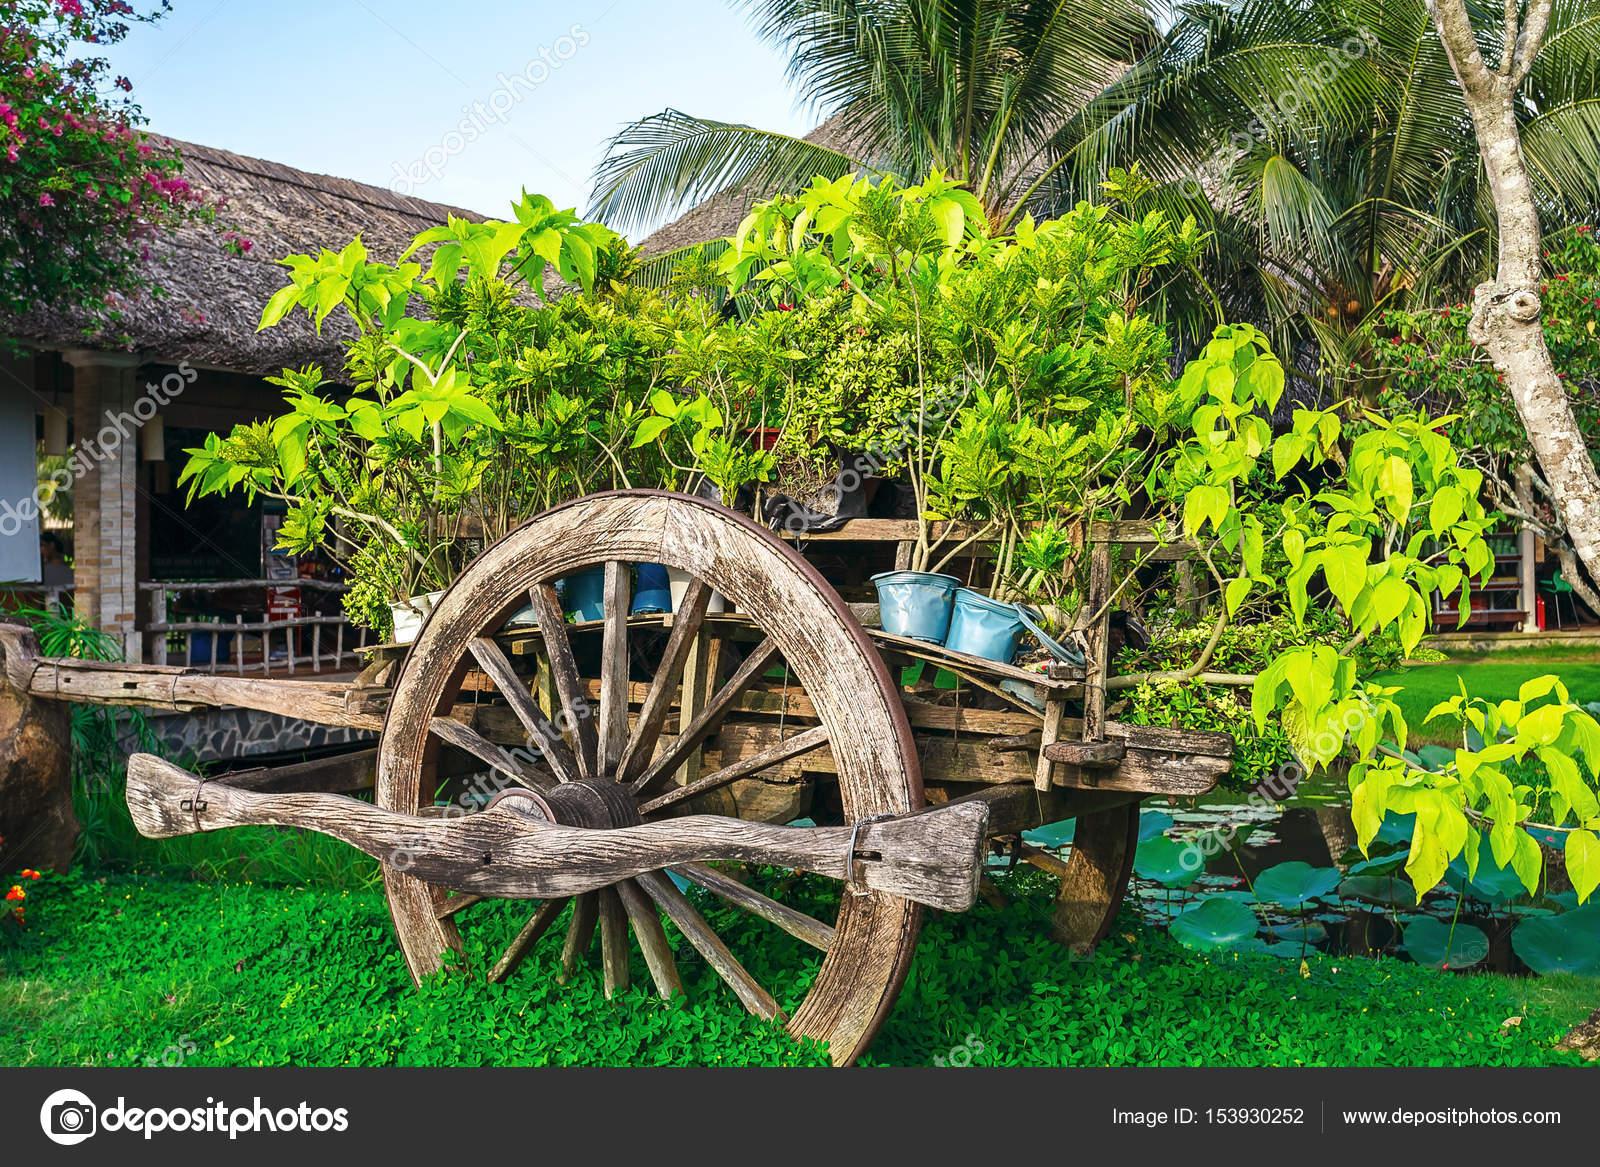 Cart, decoration, garden, Park — Stock Photo © SergeyTimofeev #153930252